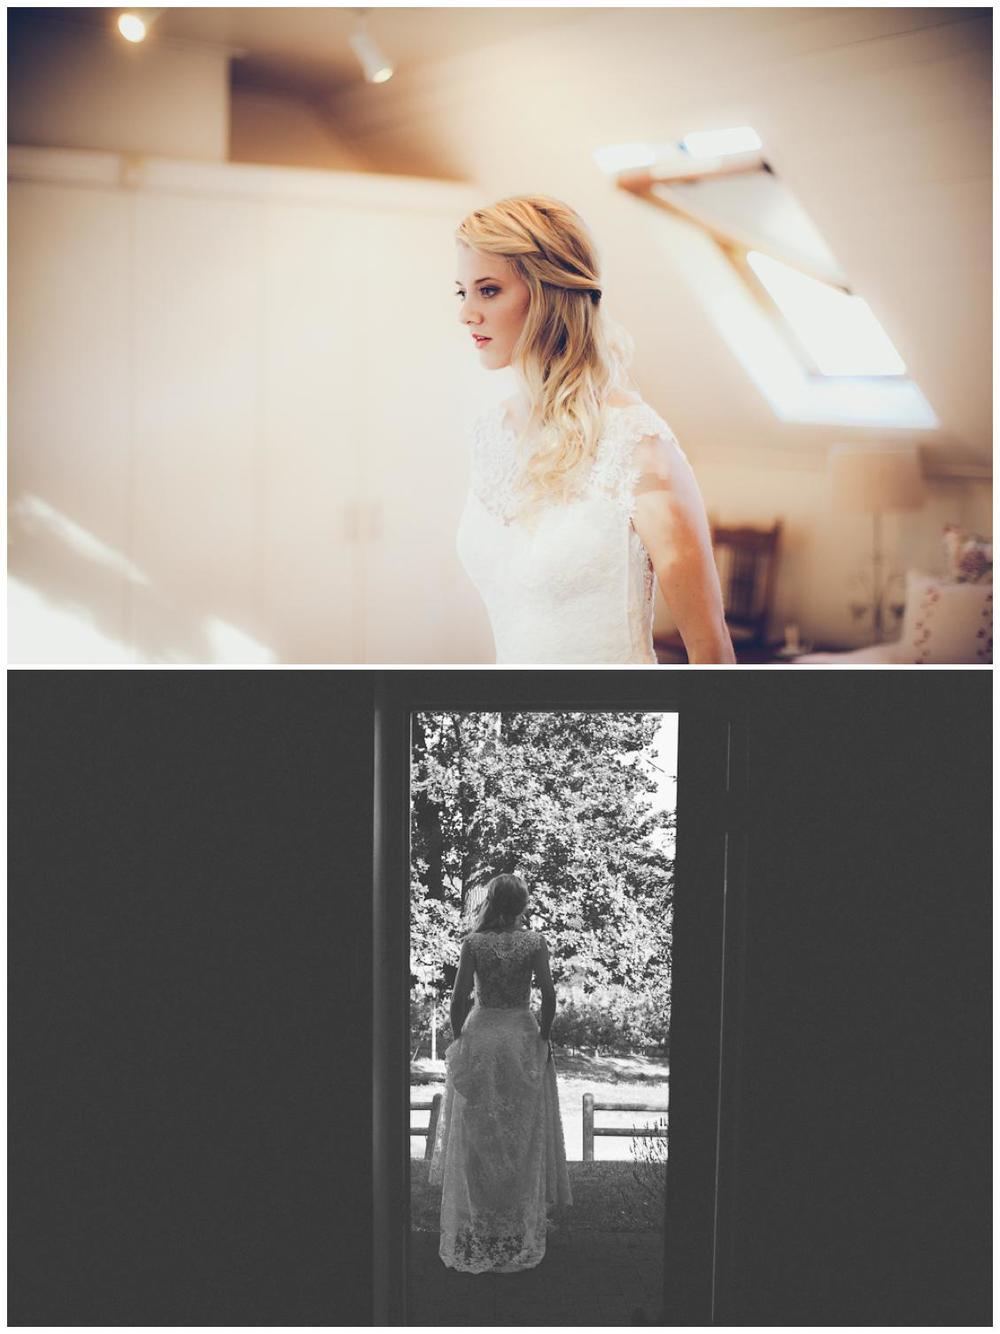 Wessel&Clarissa_FionaClairPhotography-30.jpg